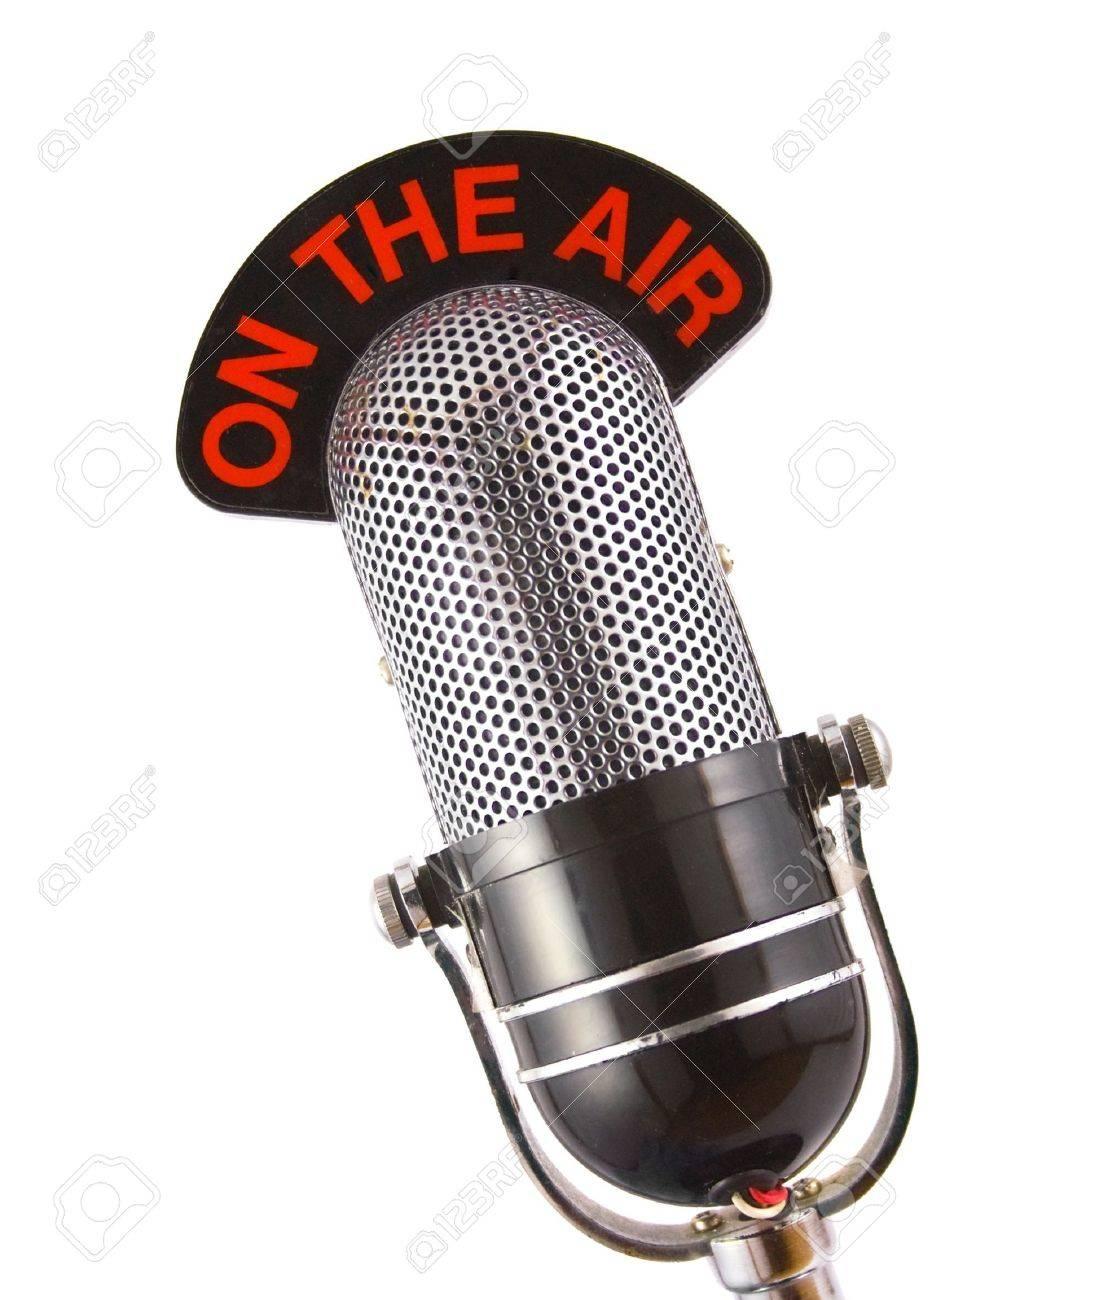 Retro microphone used for radio, talk back, news broadcasts Stock Photo - 2989704